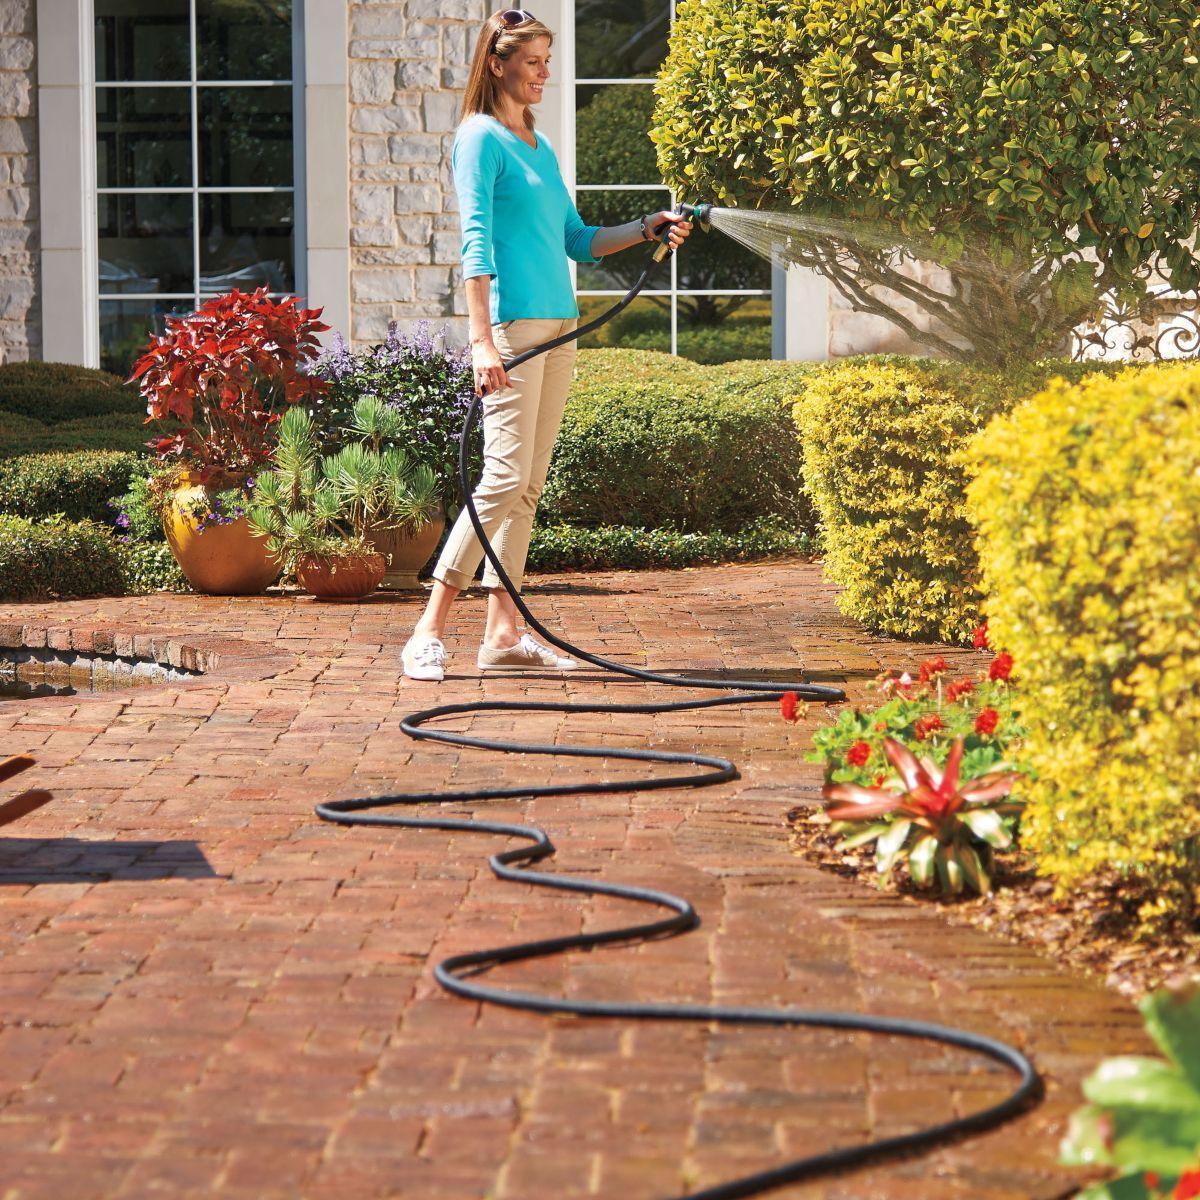 Landscaping   Gardening   Improvements Catalog